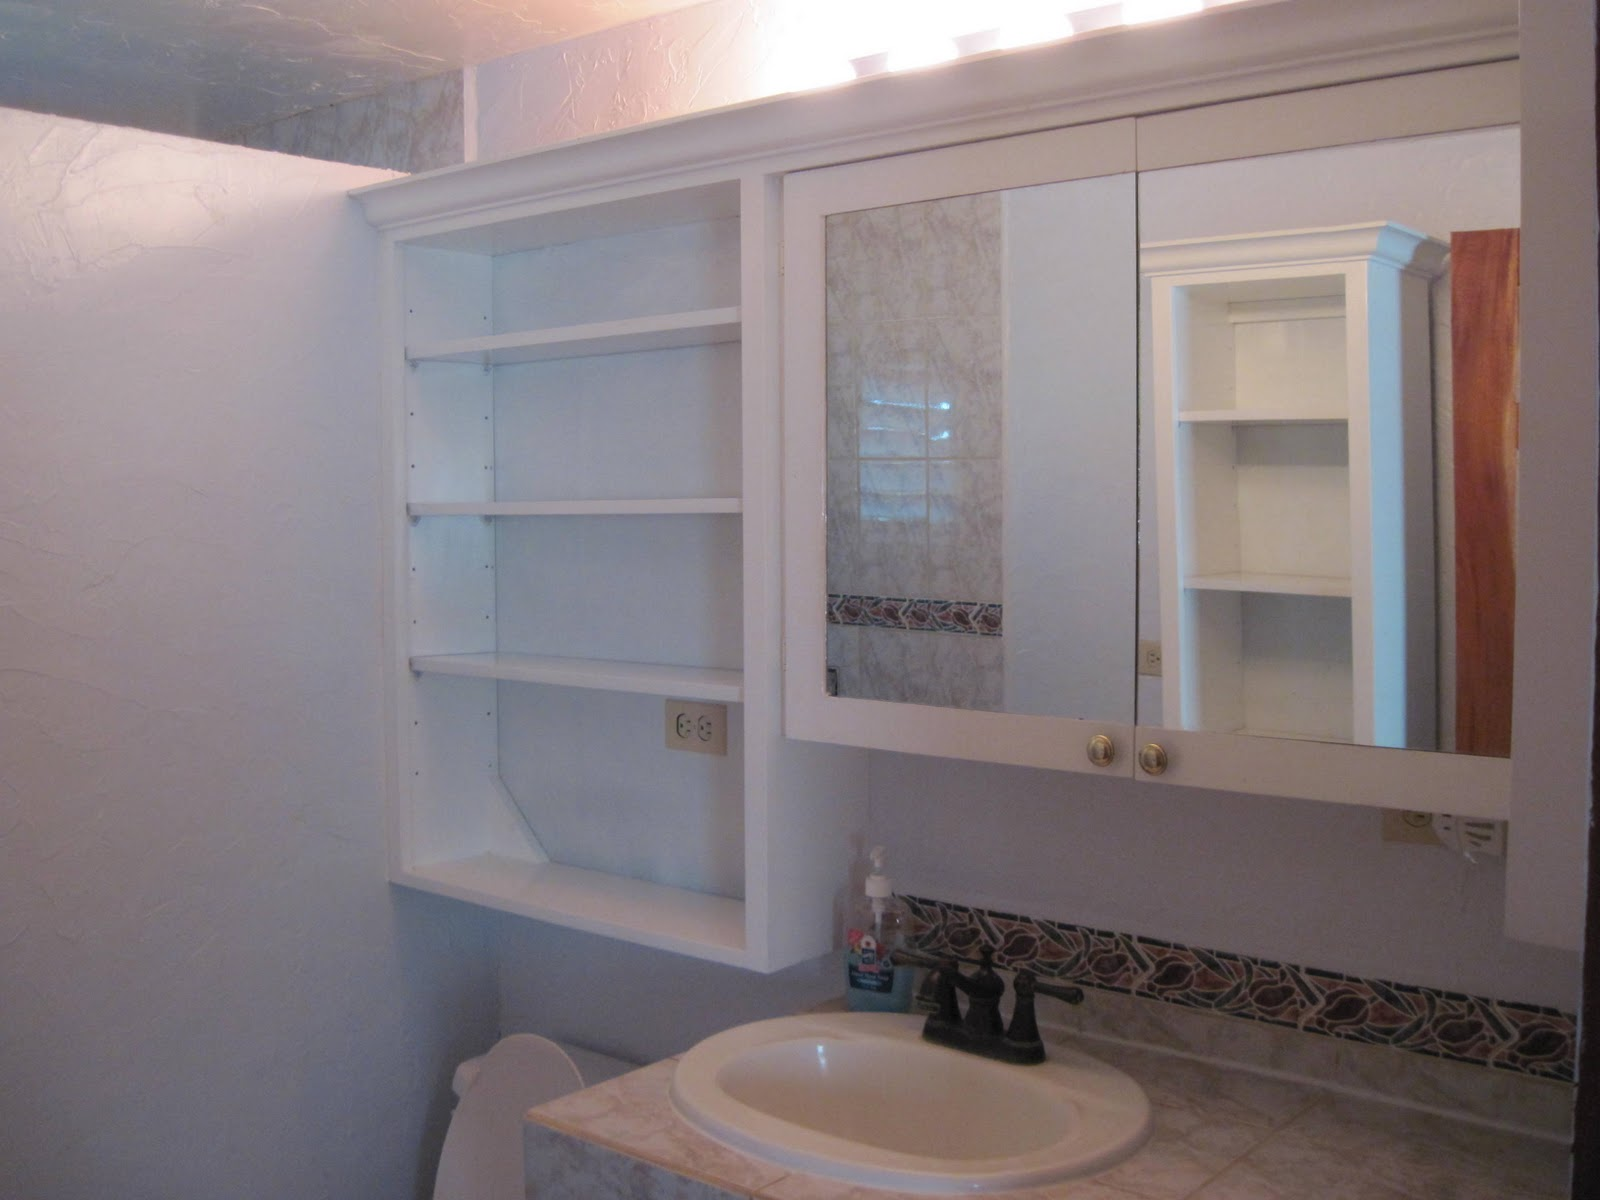 Winjama: Bathroom's Finishing Touches